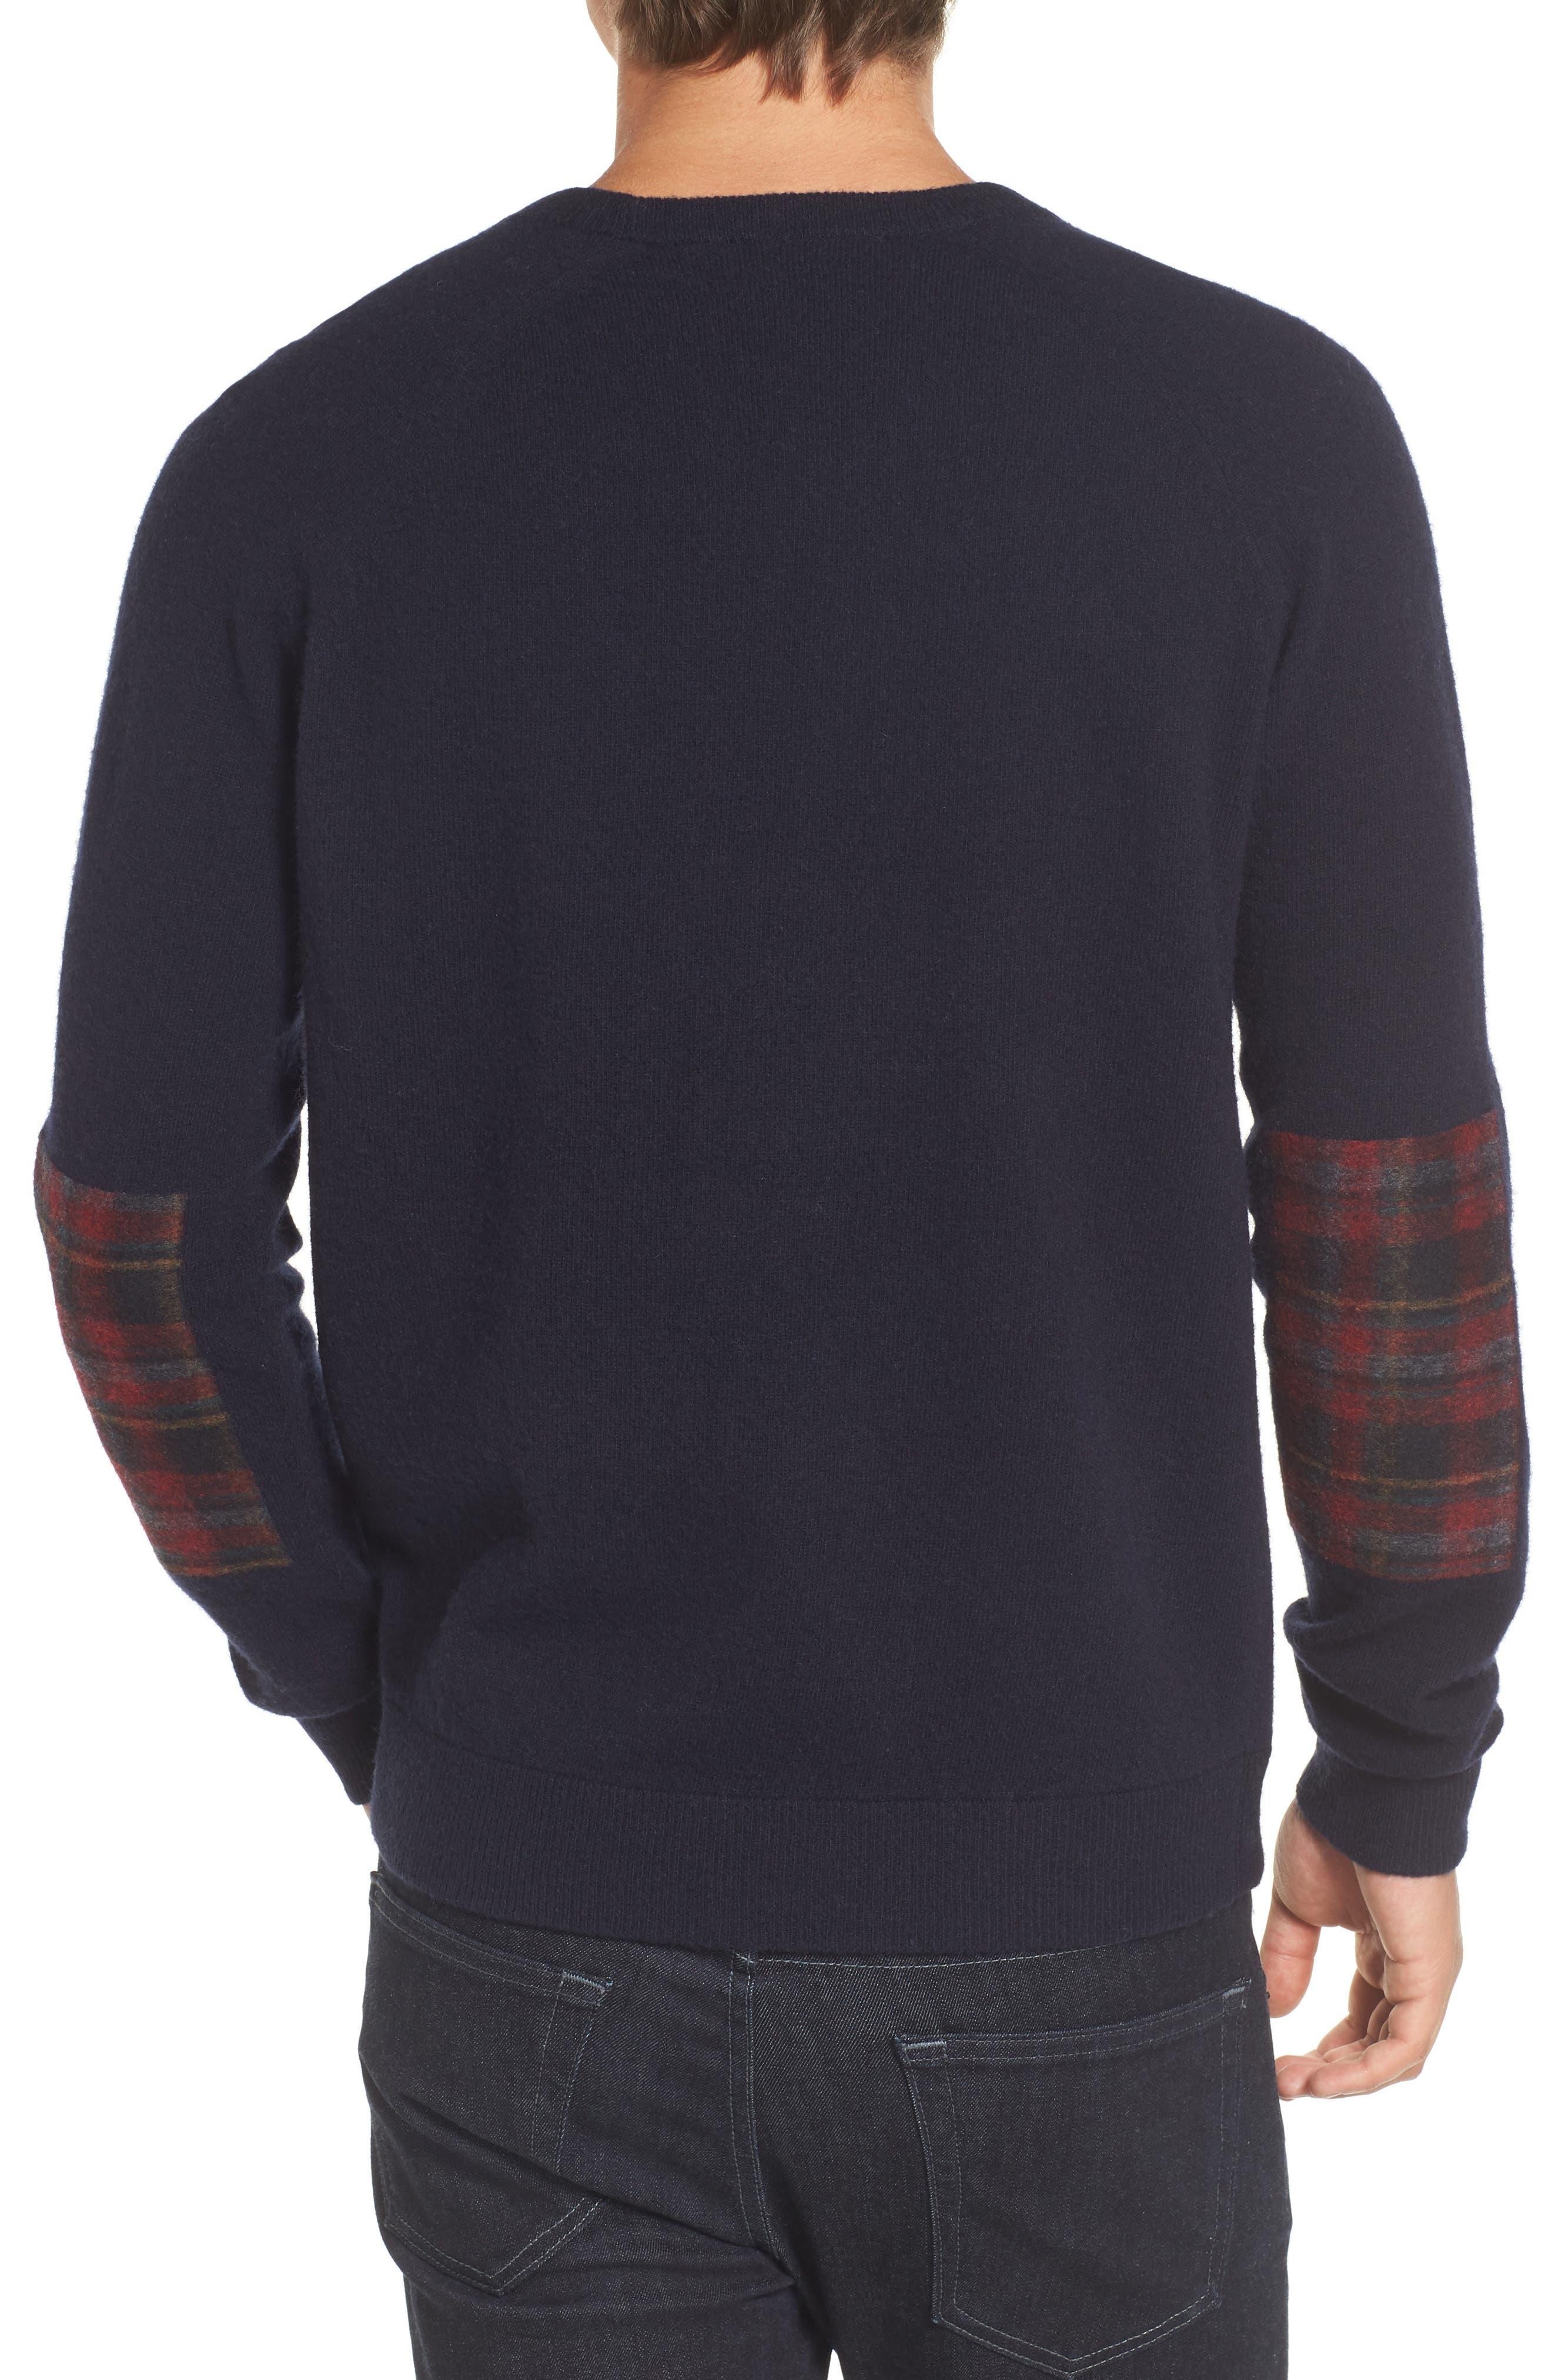 Crewneck Wool Sweater,                             Alternate thumbnail 2, color,                             Marine Blue/ Tartan